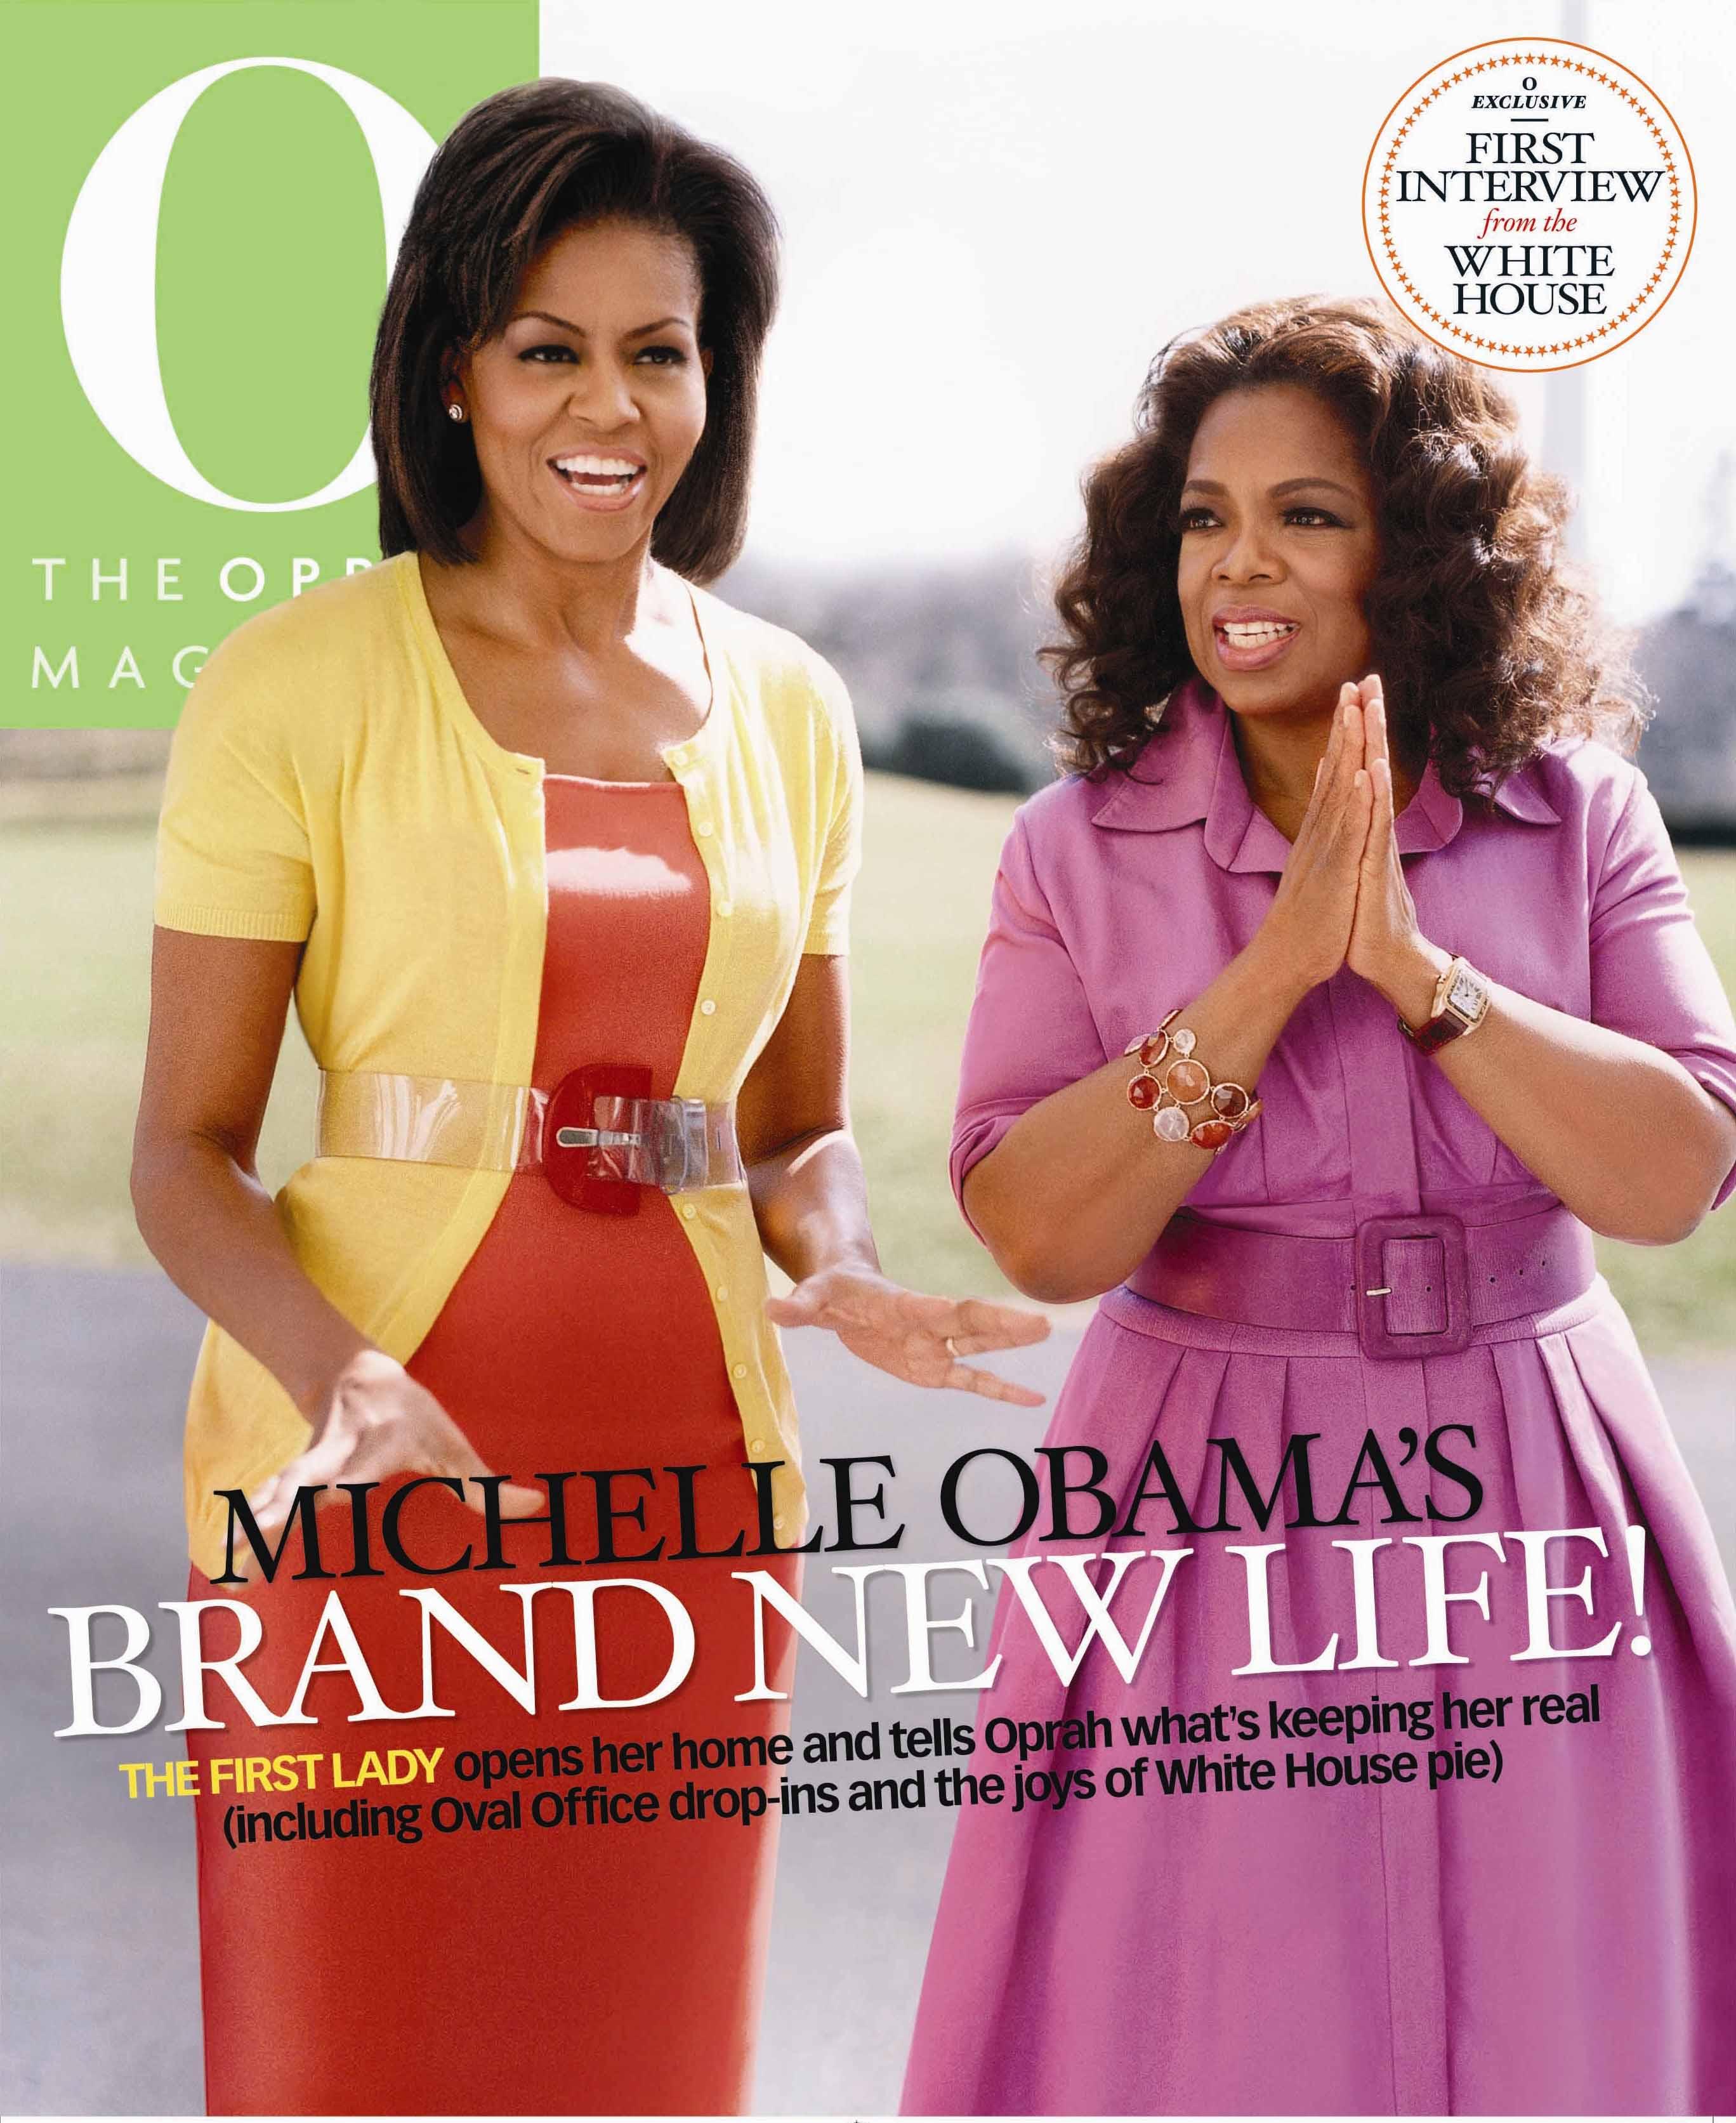 Estimating The IQ Of Michelle Obama Pumpkin Person Fbf adfeafa Pi Estimating The Iq Of Michelle Obama